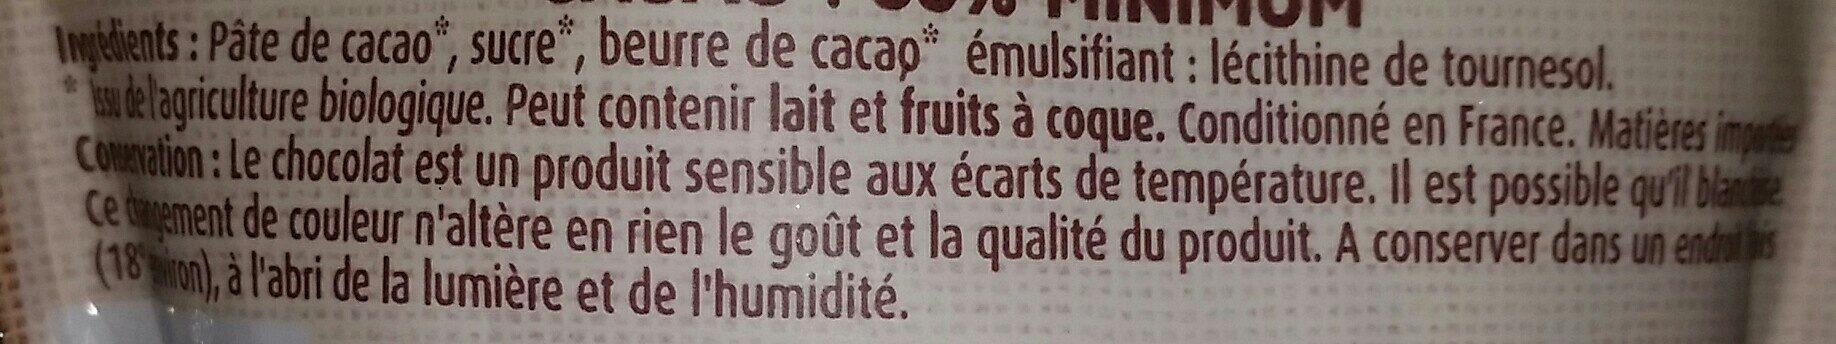 Pépites chocolat noir Bio - Ingrédients - fr